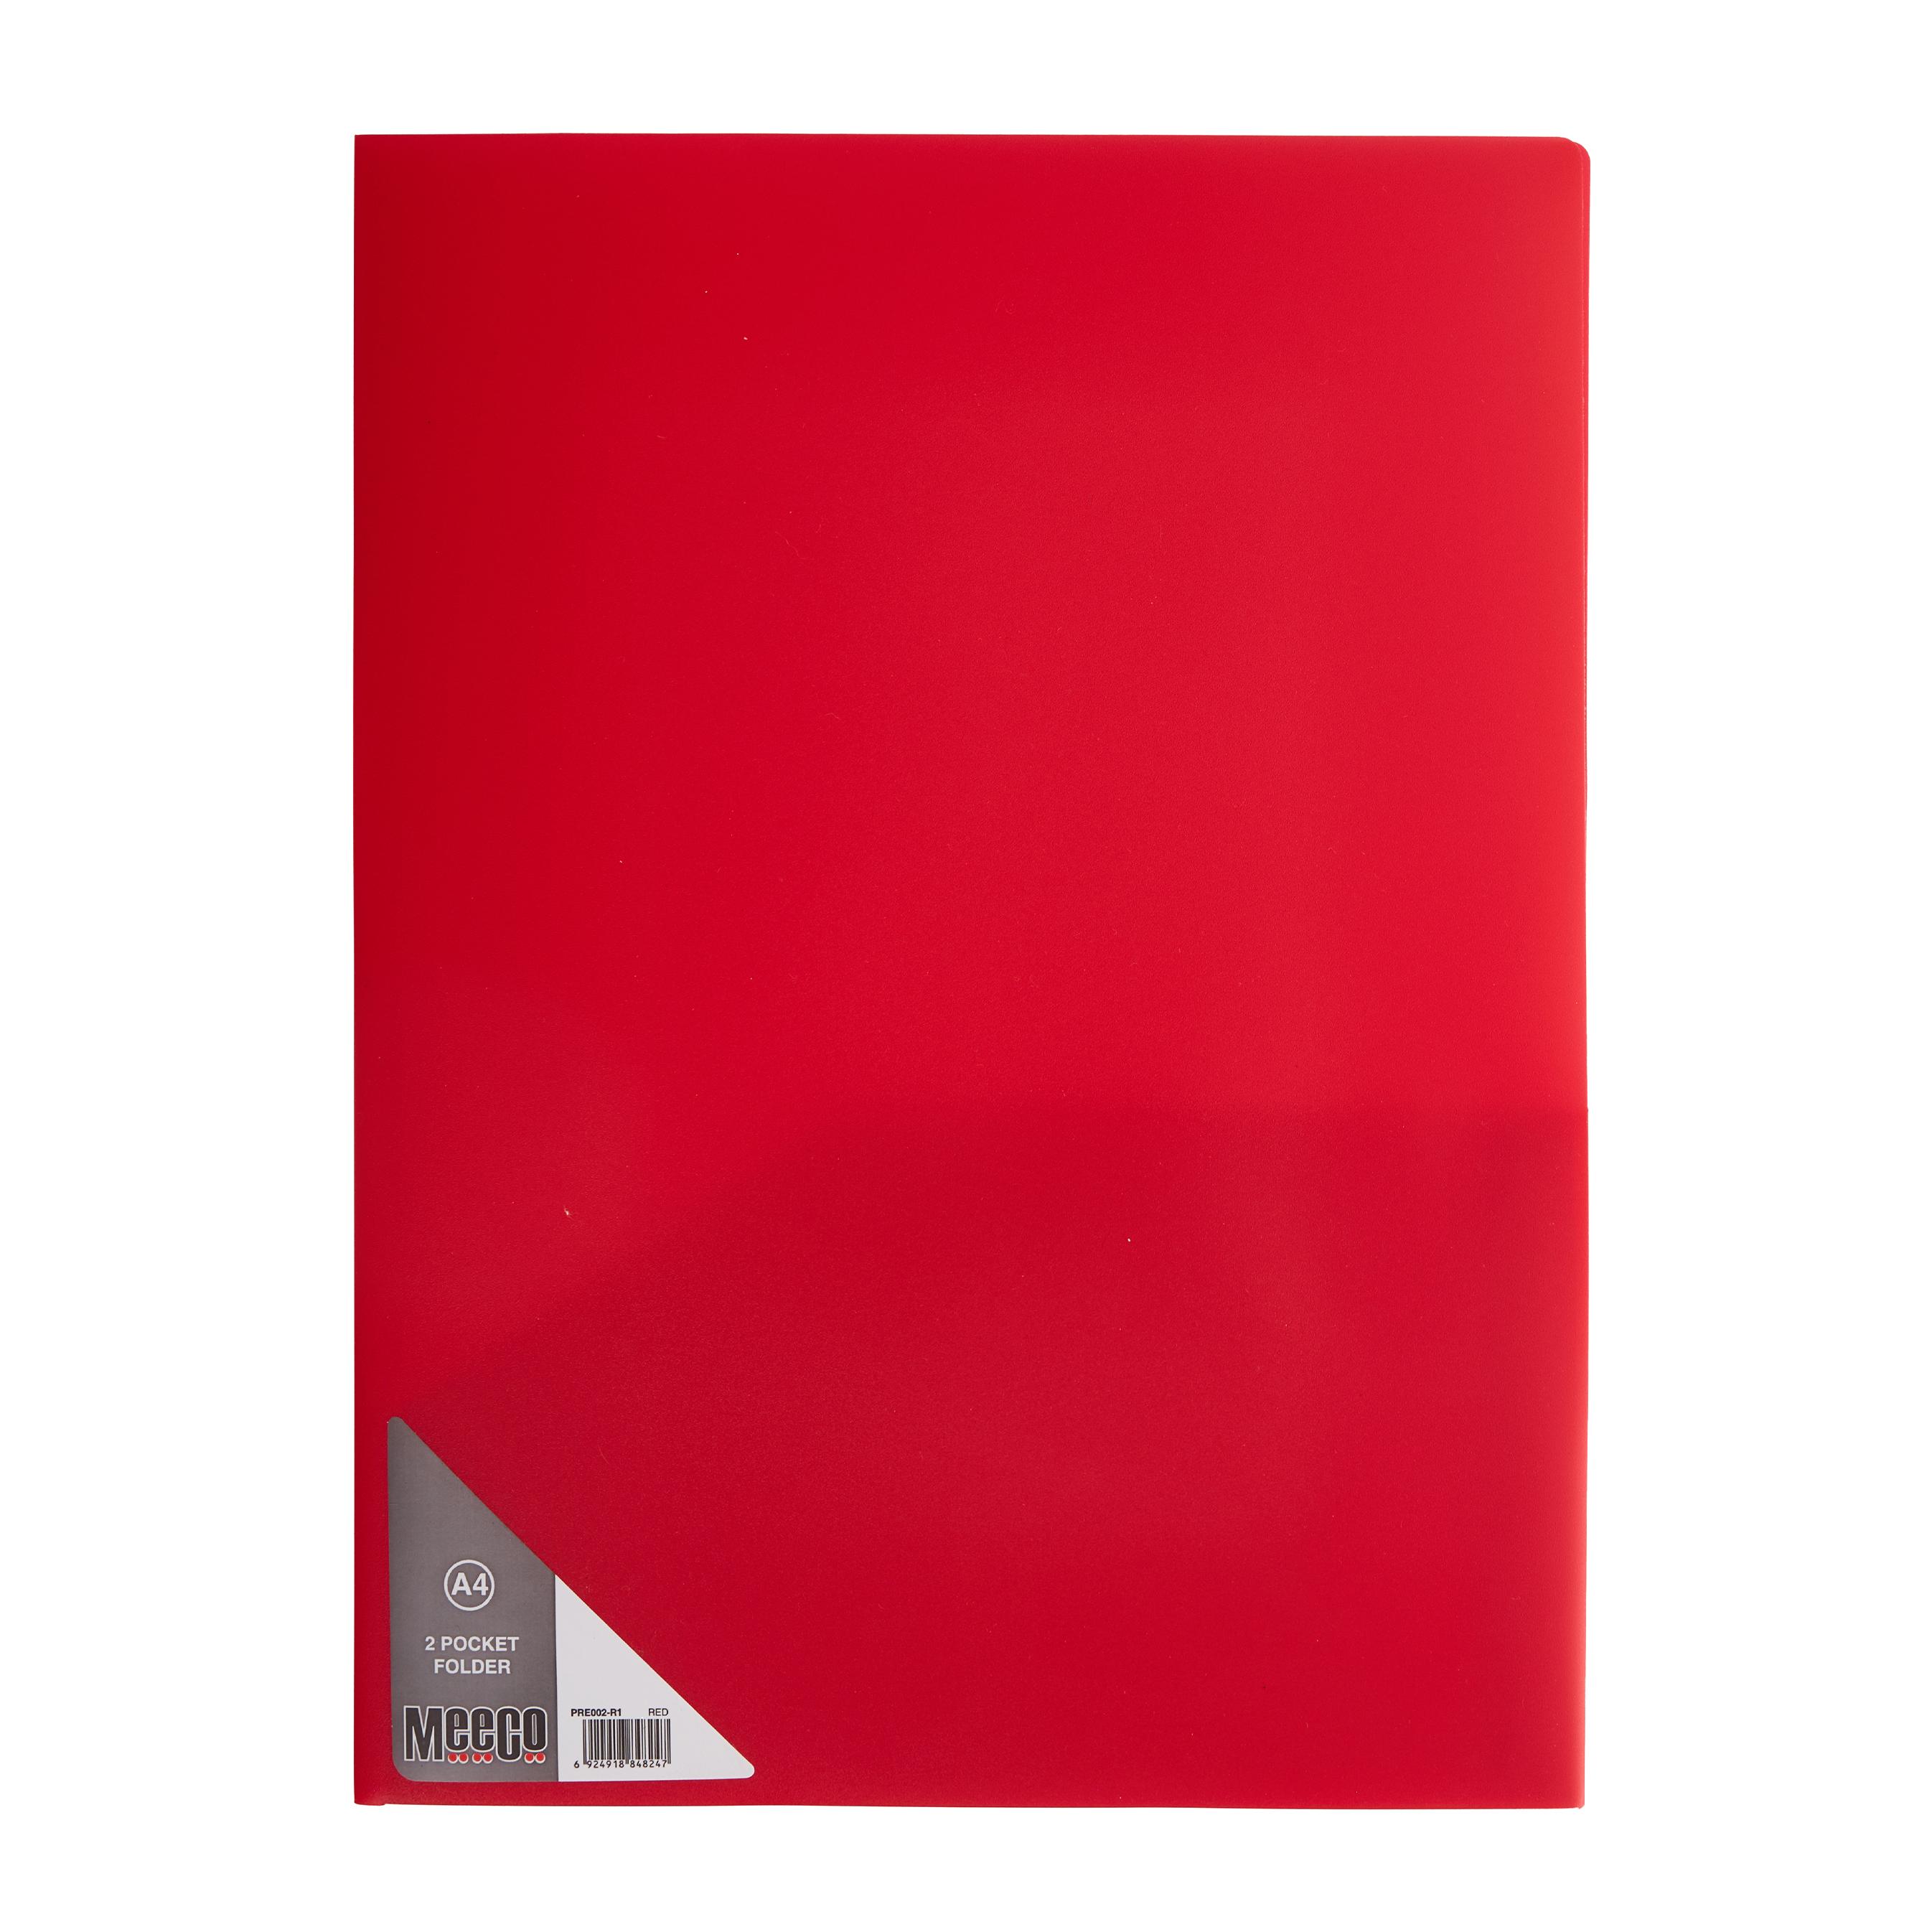 2 Pocket Folder (A4)